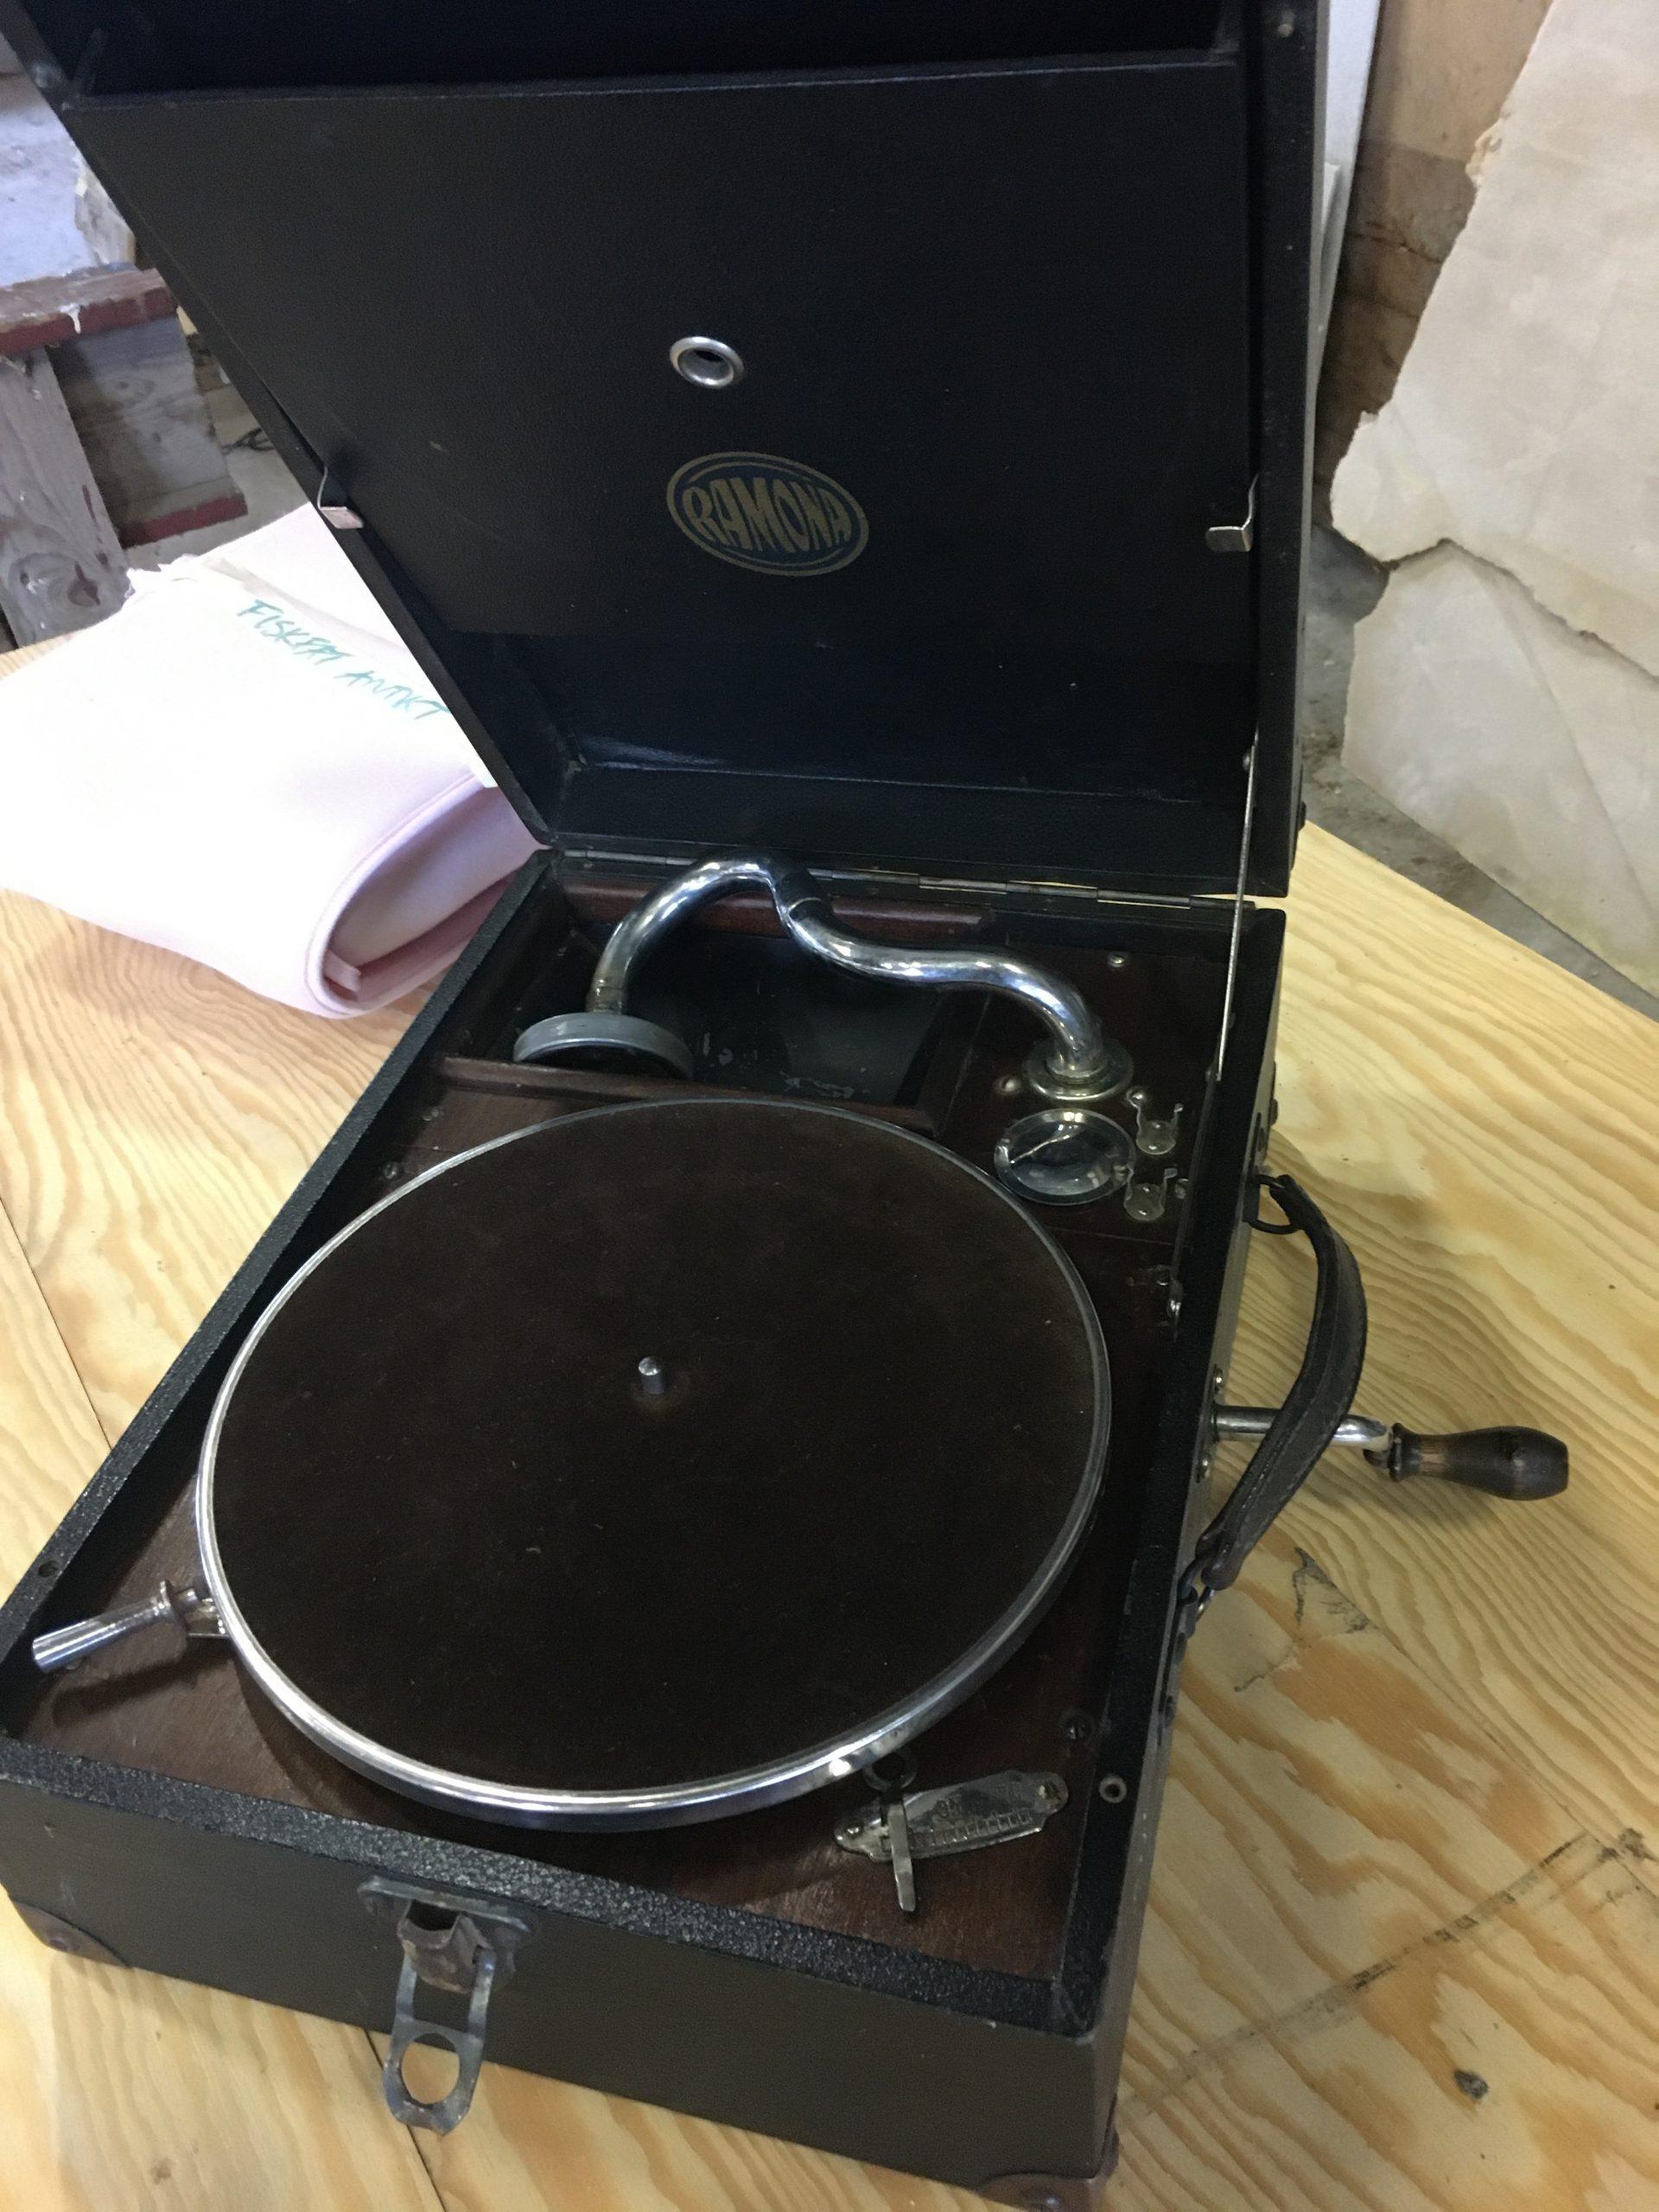 grammofon - test2